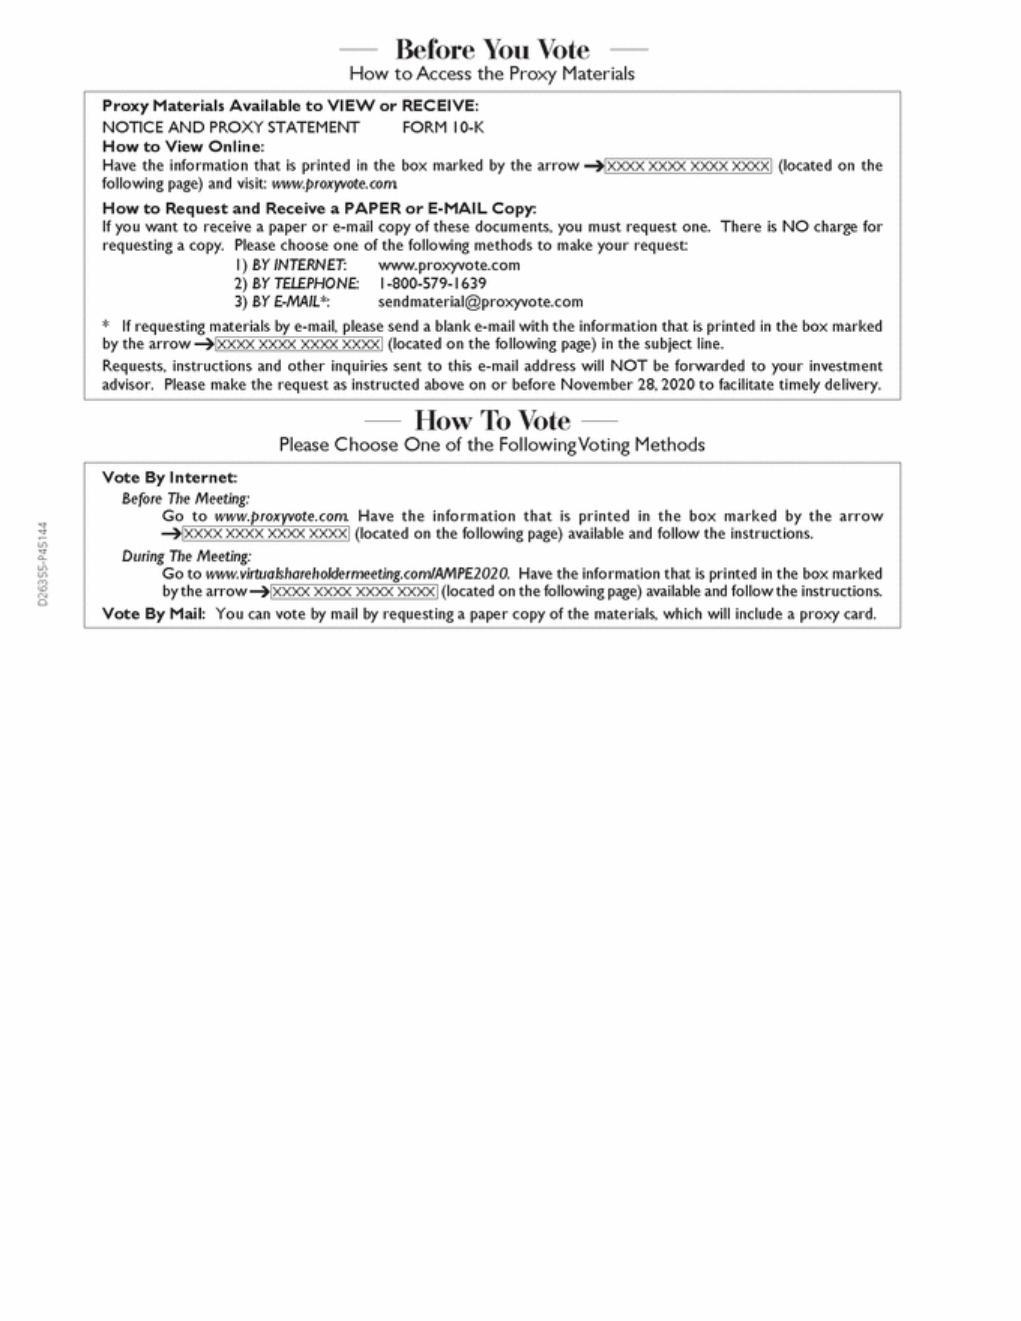 20-12345-1 BA_AMPIO PHARMACEUTICALS IN- CC_PAGE_2.GIF